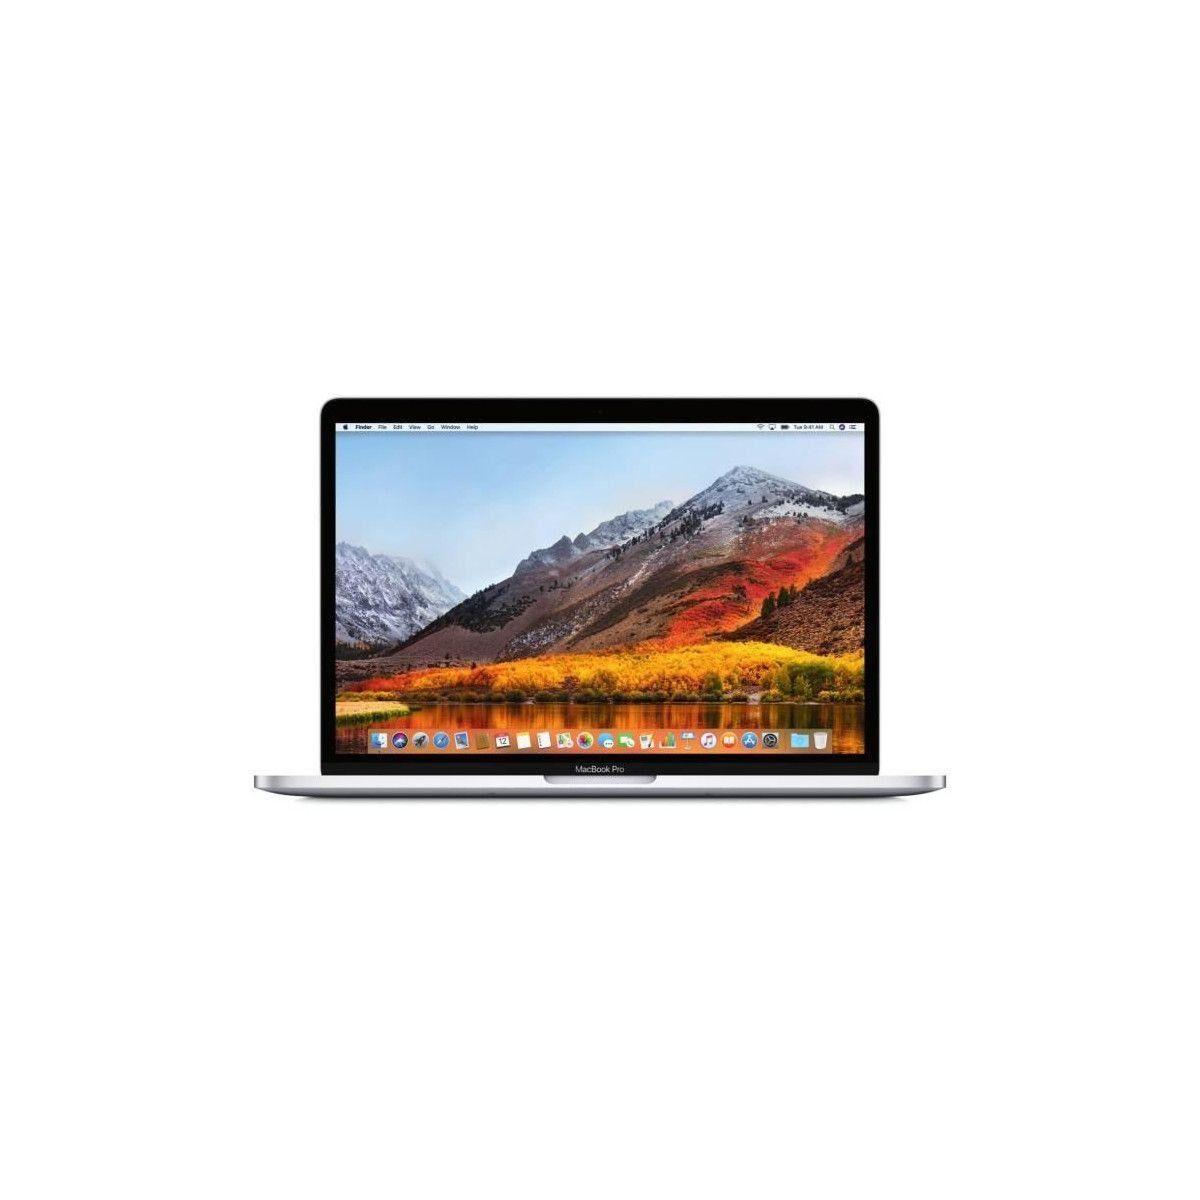 APPLE MacBook Pro MPXU2FN/A - 13,3 pouces Retina - Intel Core i5 - RAM 8Go - Stockage 256Go SSD - Argent